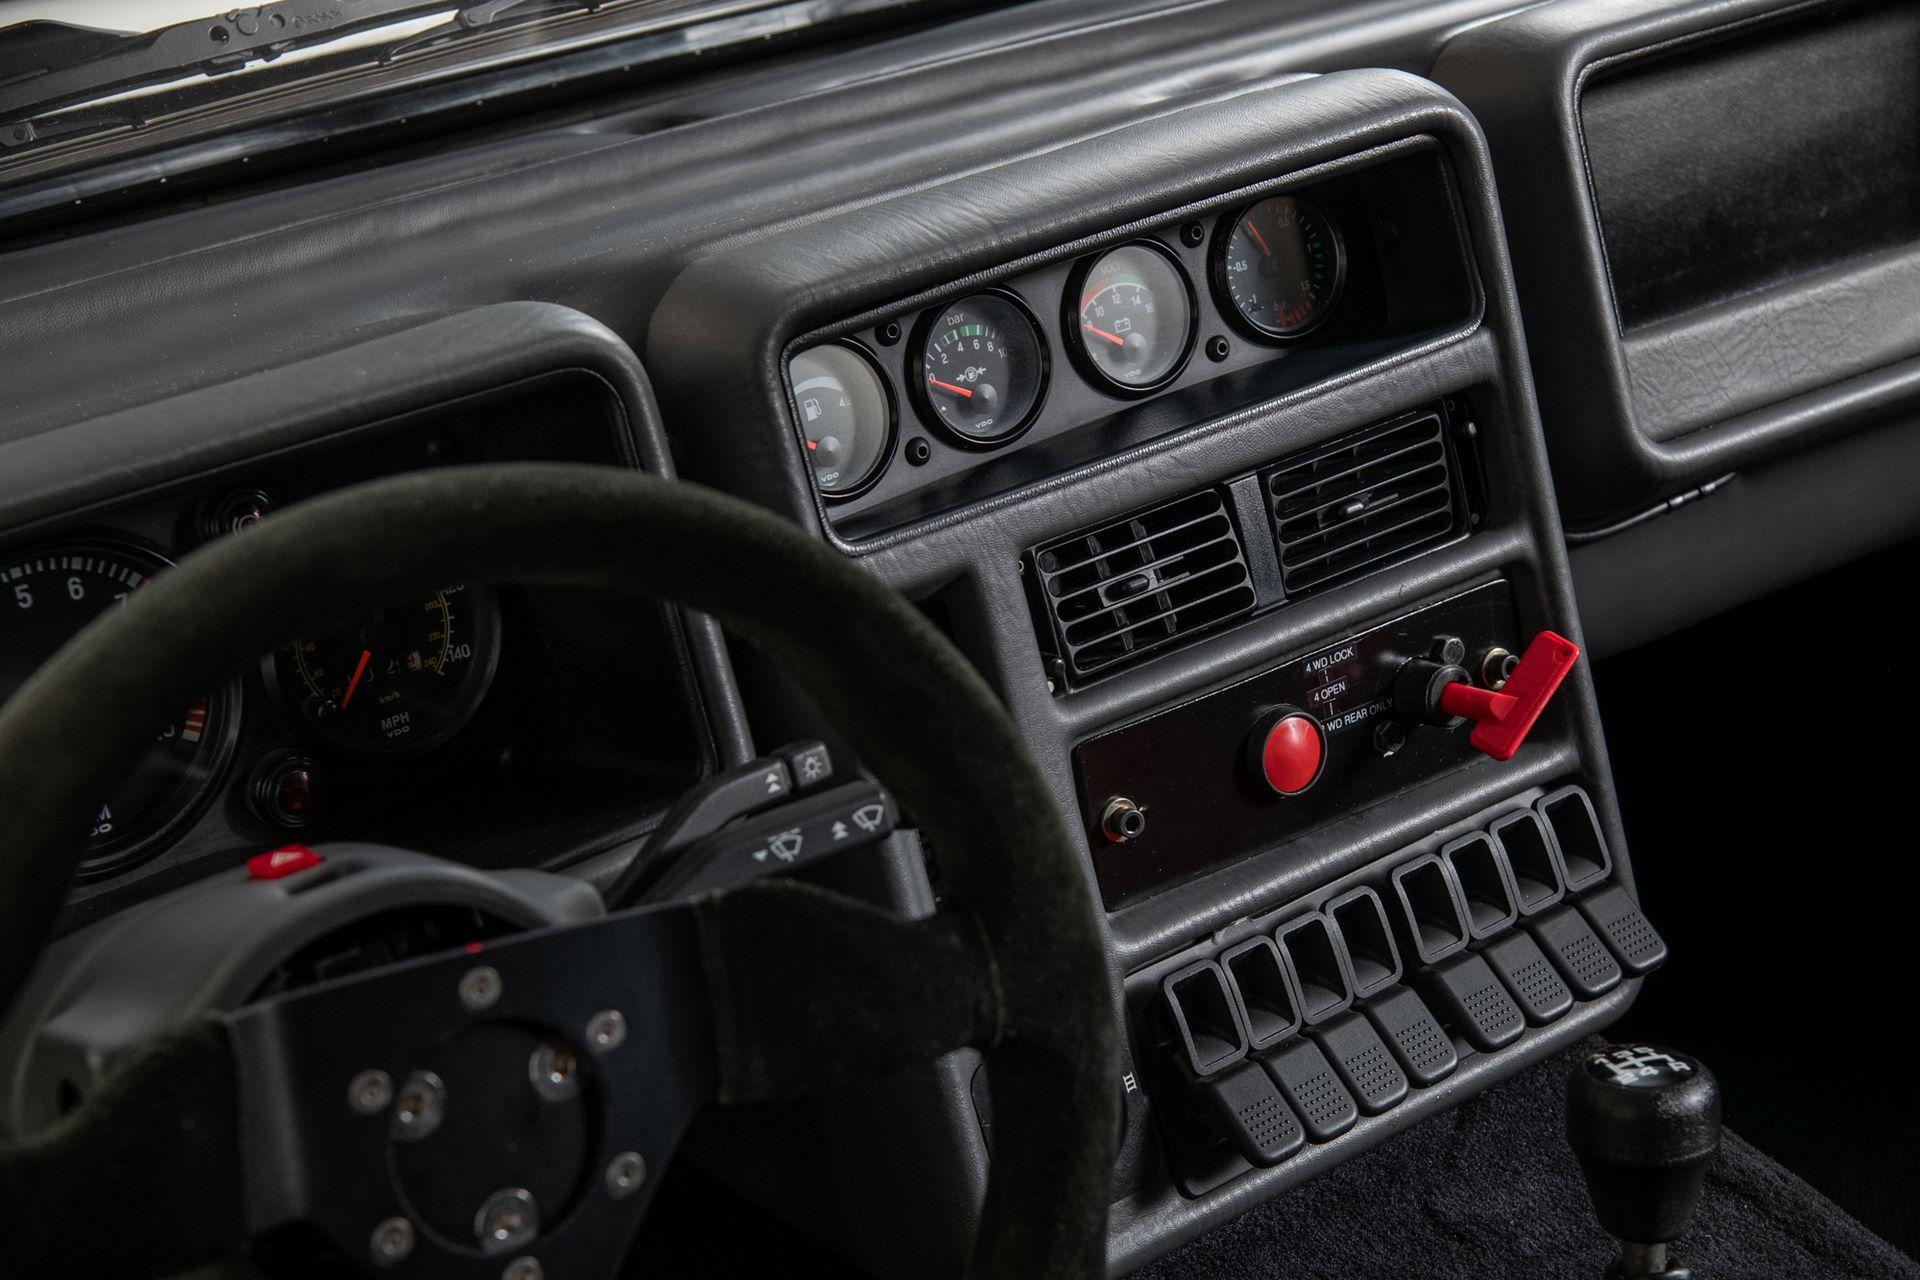 Ford-RS200-Evolution-Evo-for-sale-7